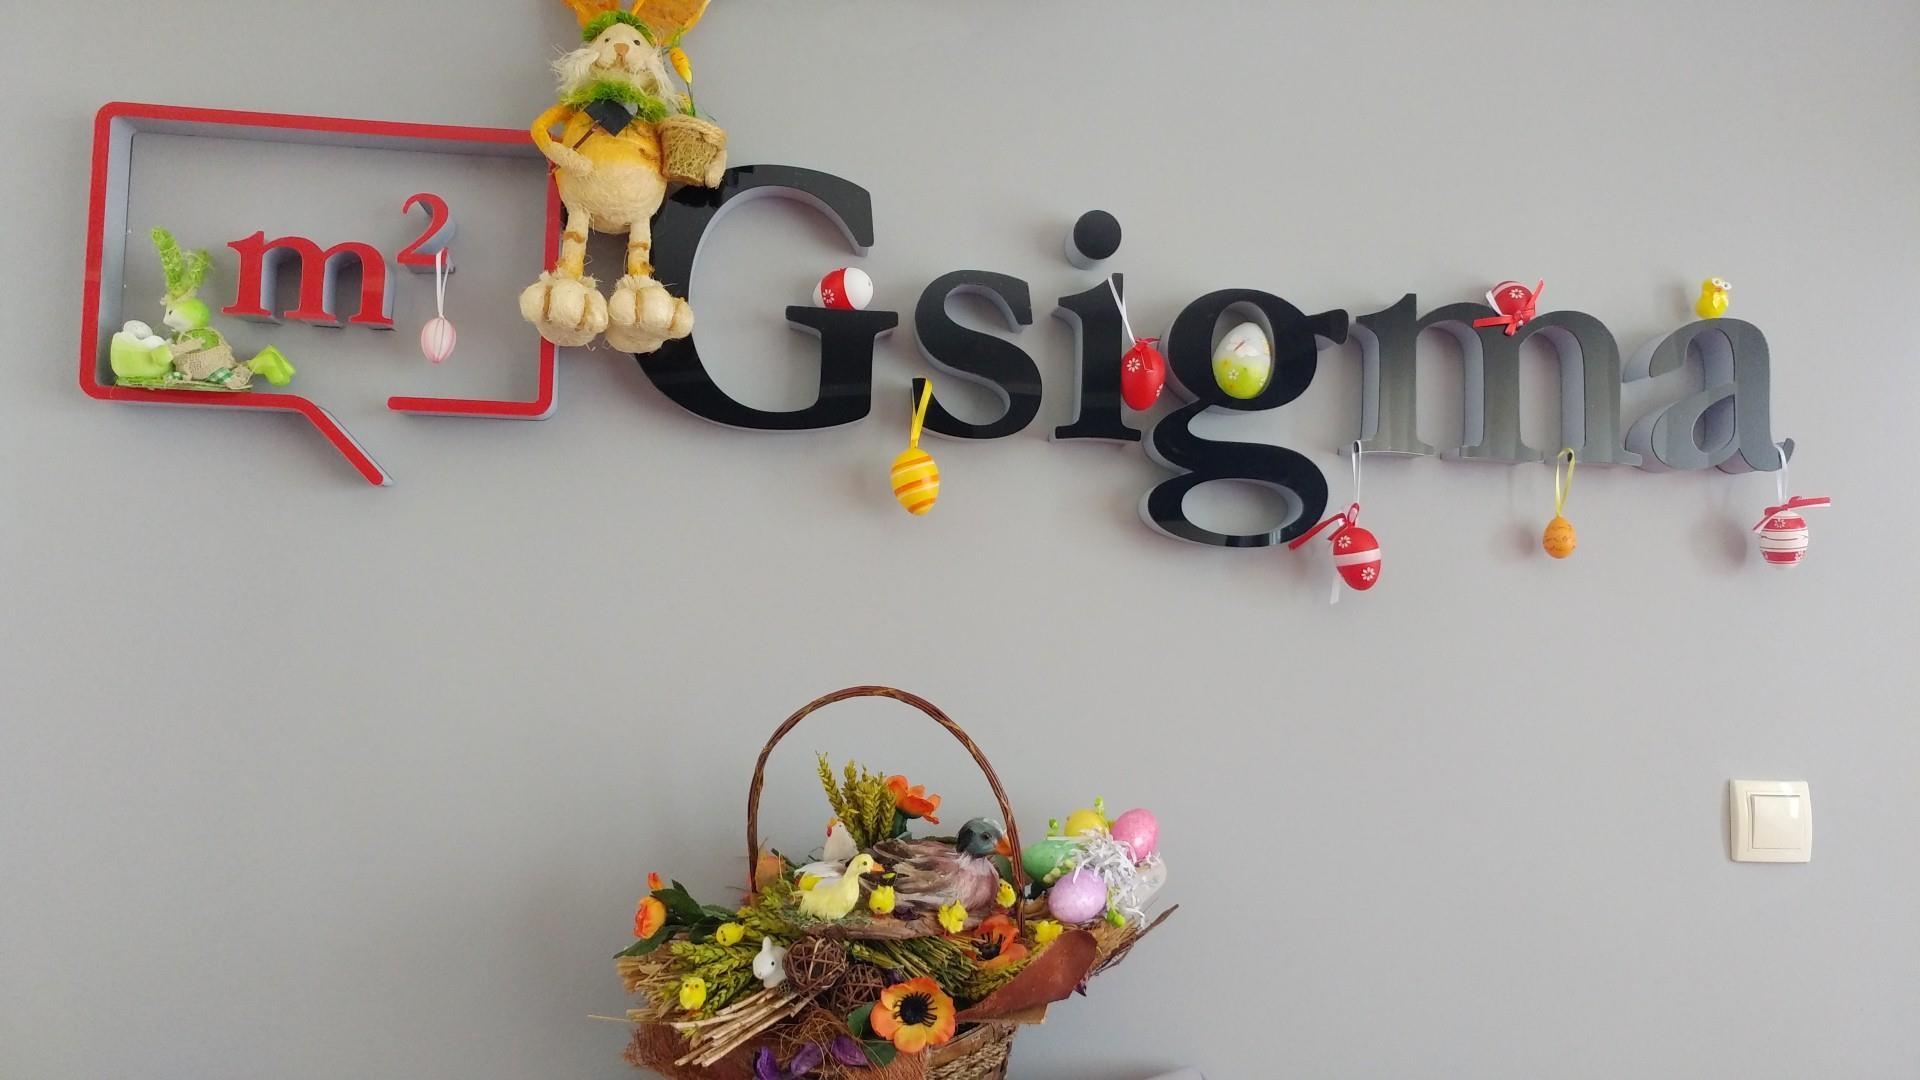 Agencija Gsigma, logo